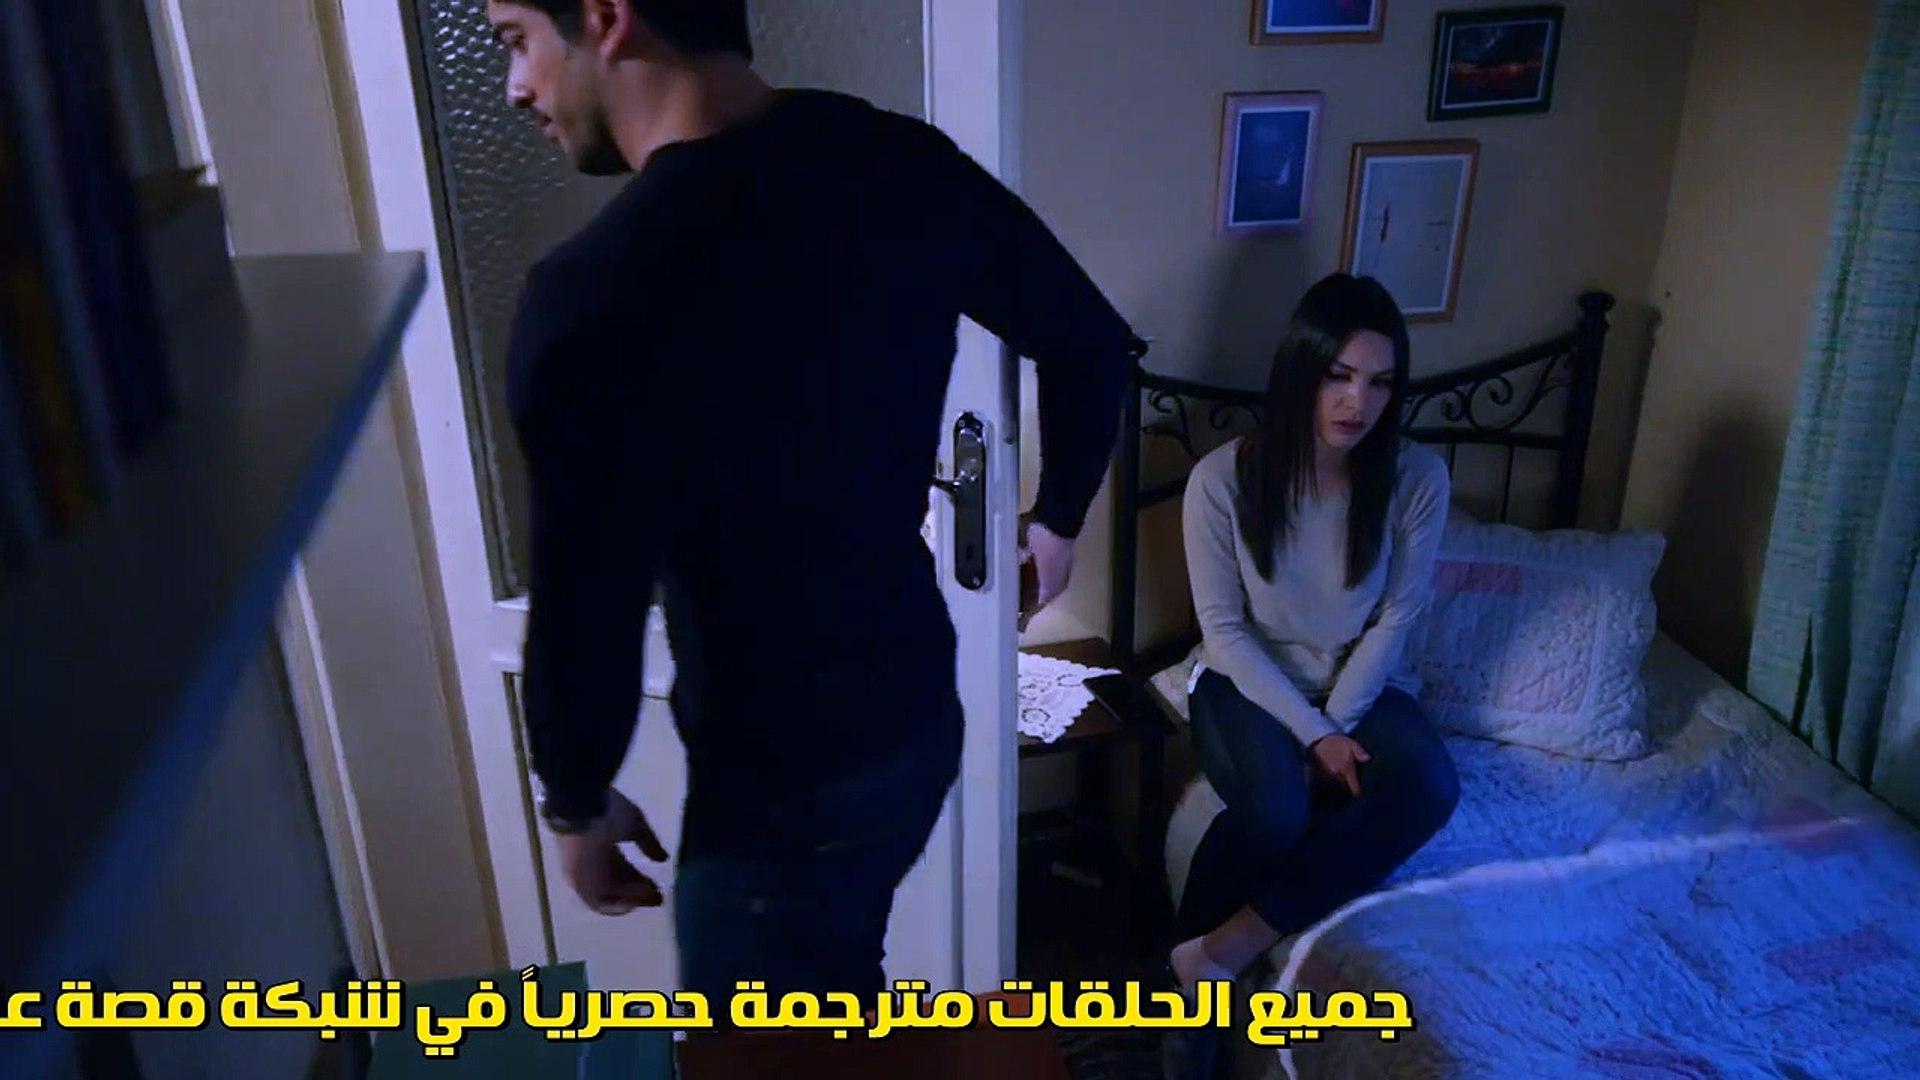 Hd مسلسل حـب اعـمـى موسم 2 مترجم الحلقة 29 قسم 3 تابعونا لمشاهدة المزيد